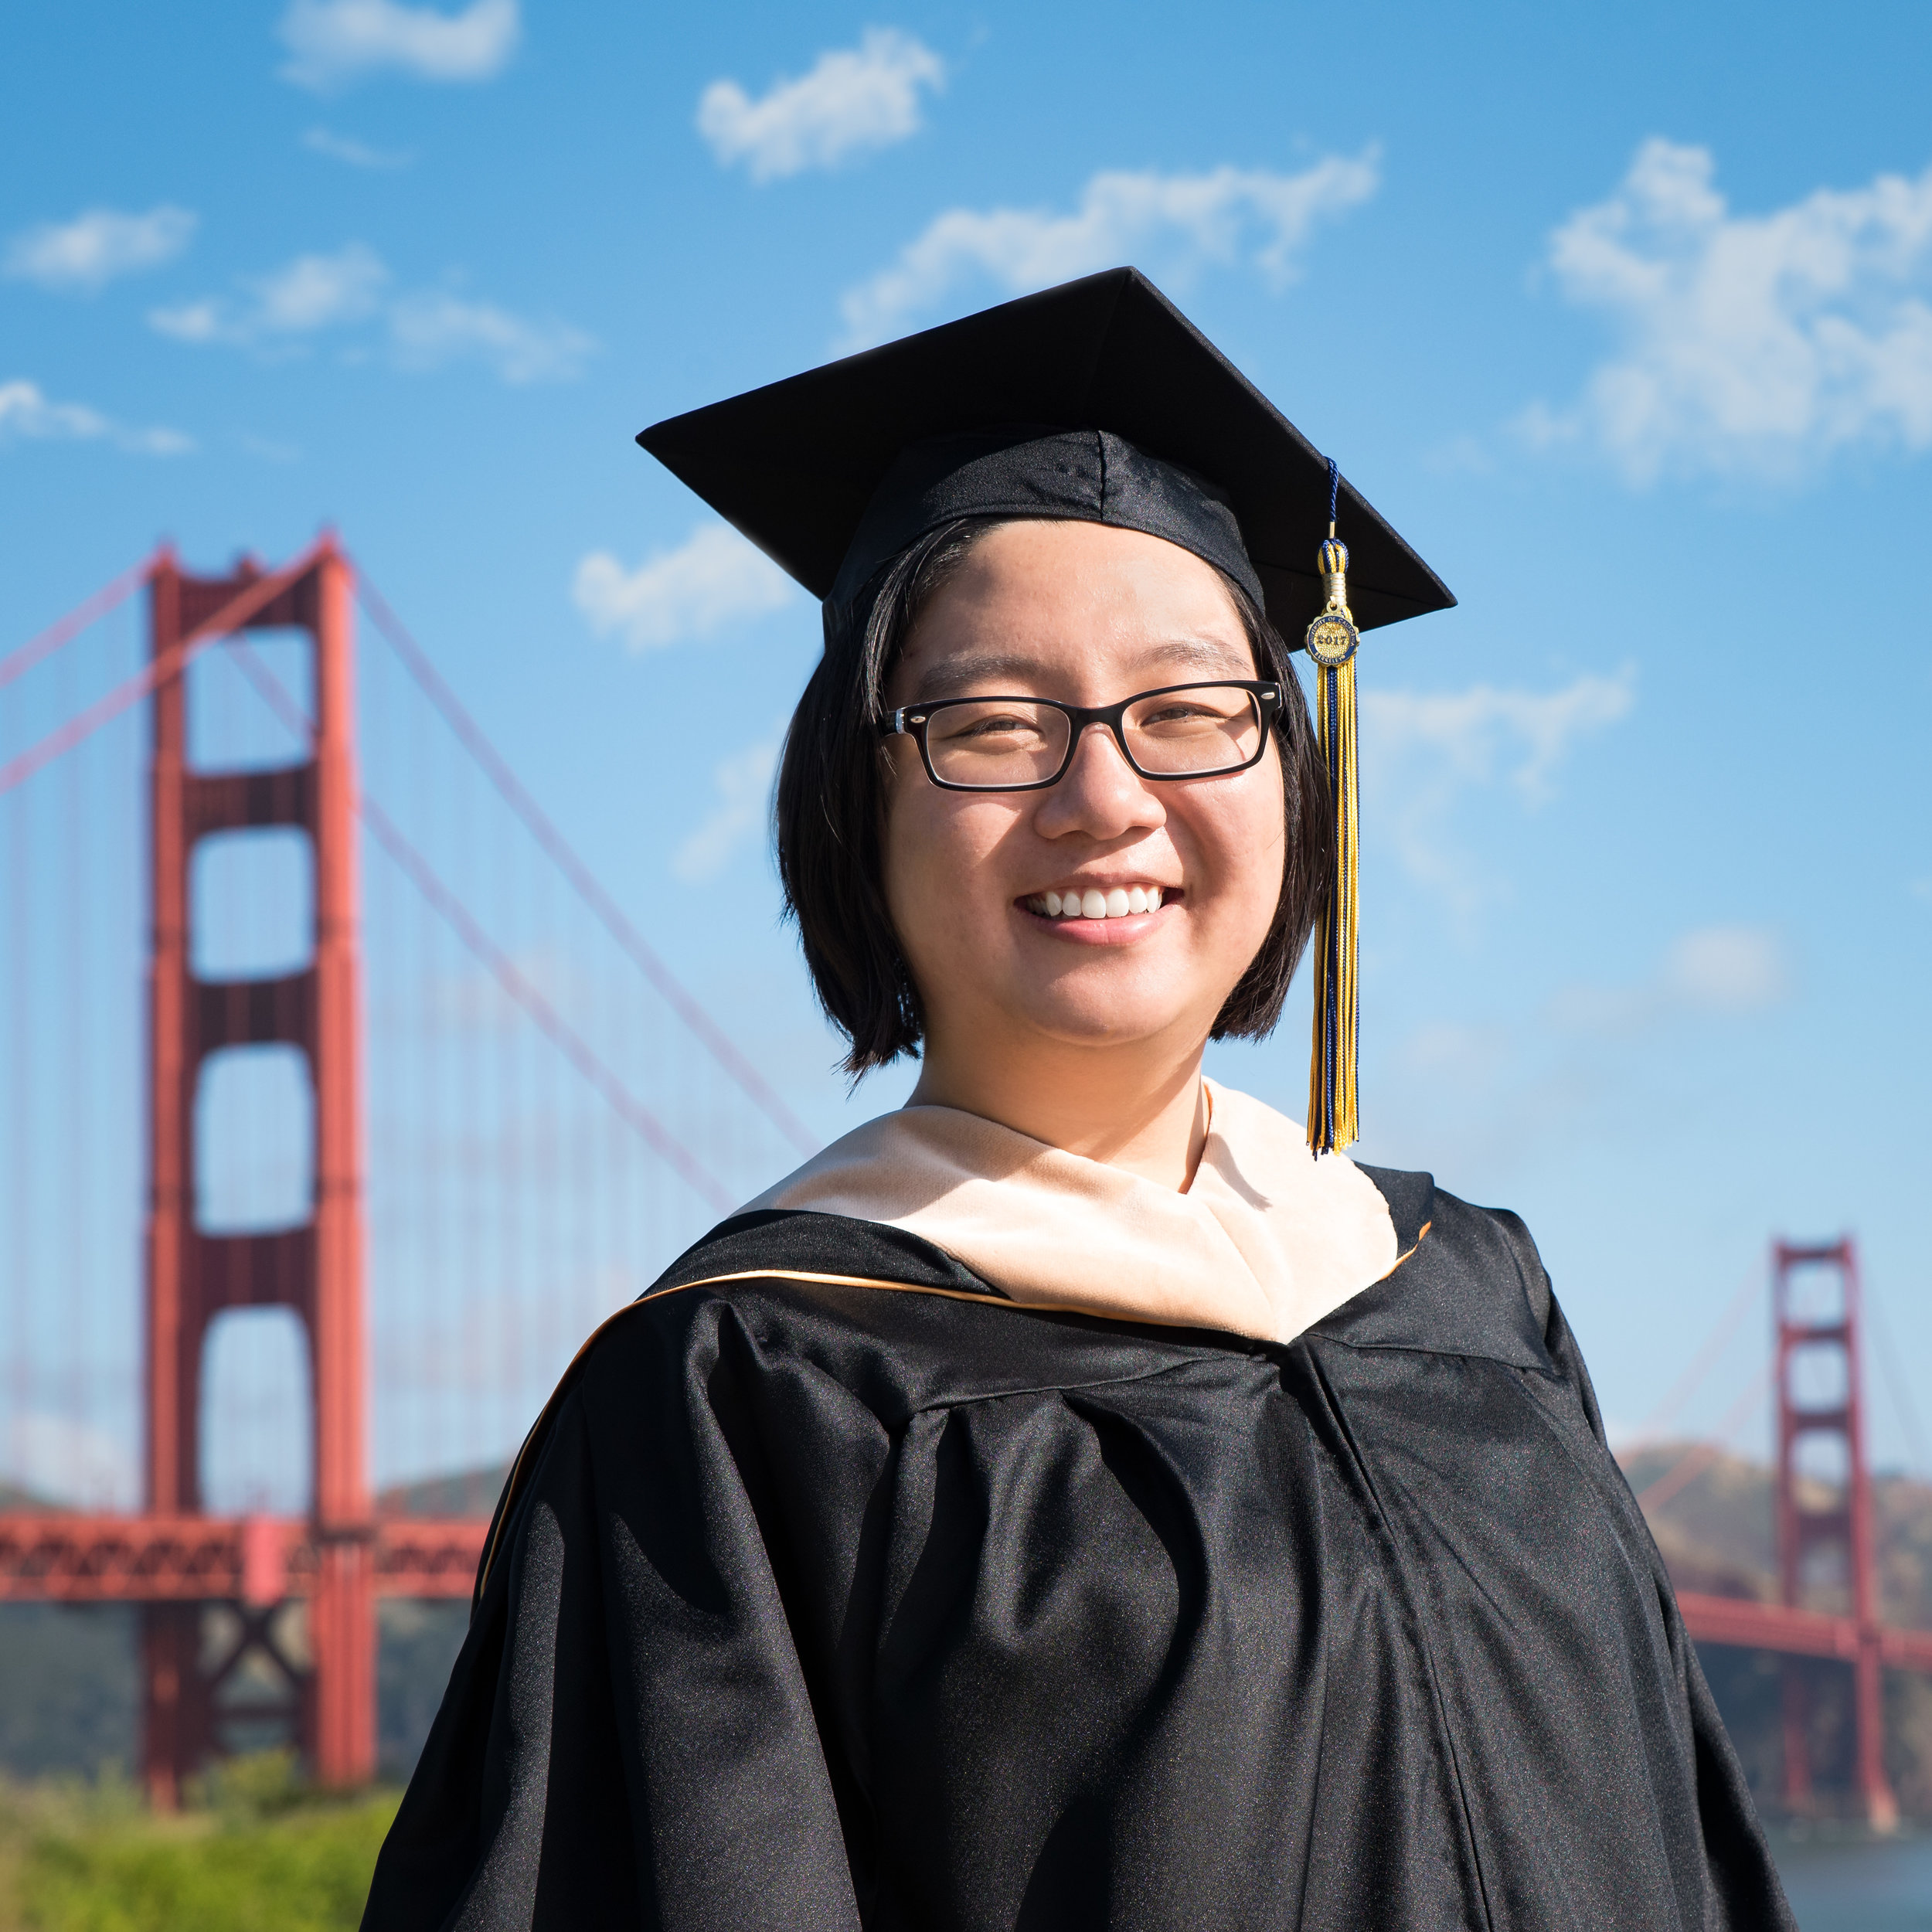 Graduation Portrait_Golden Gate Bridge_Liz.jpg